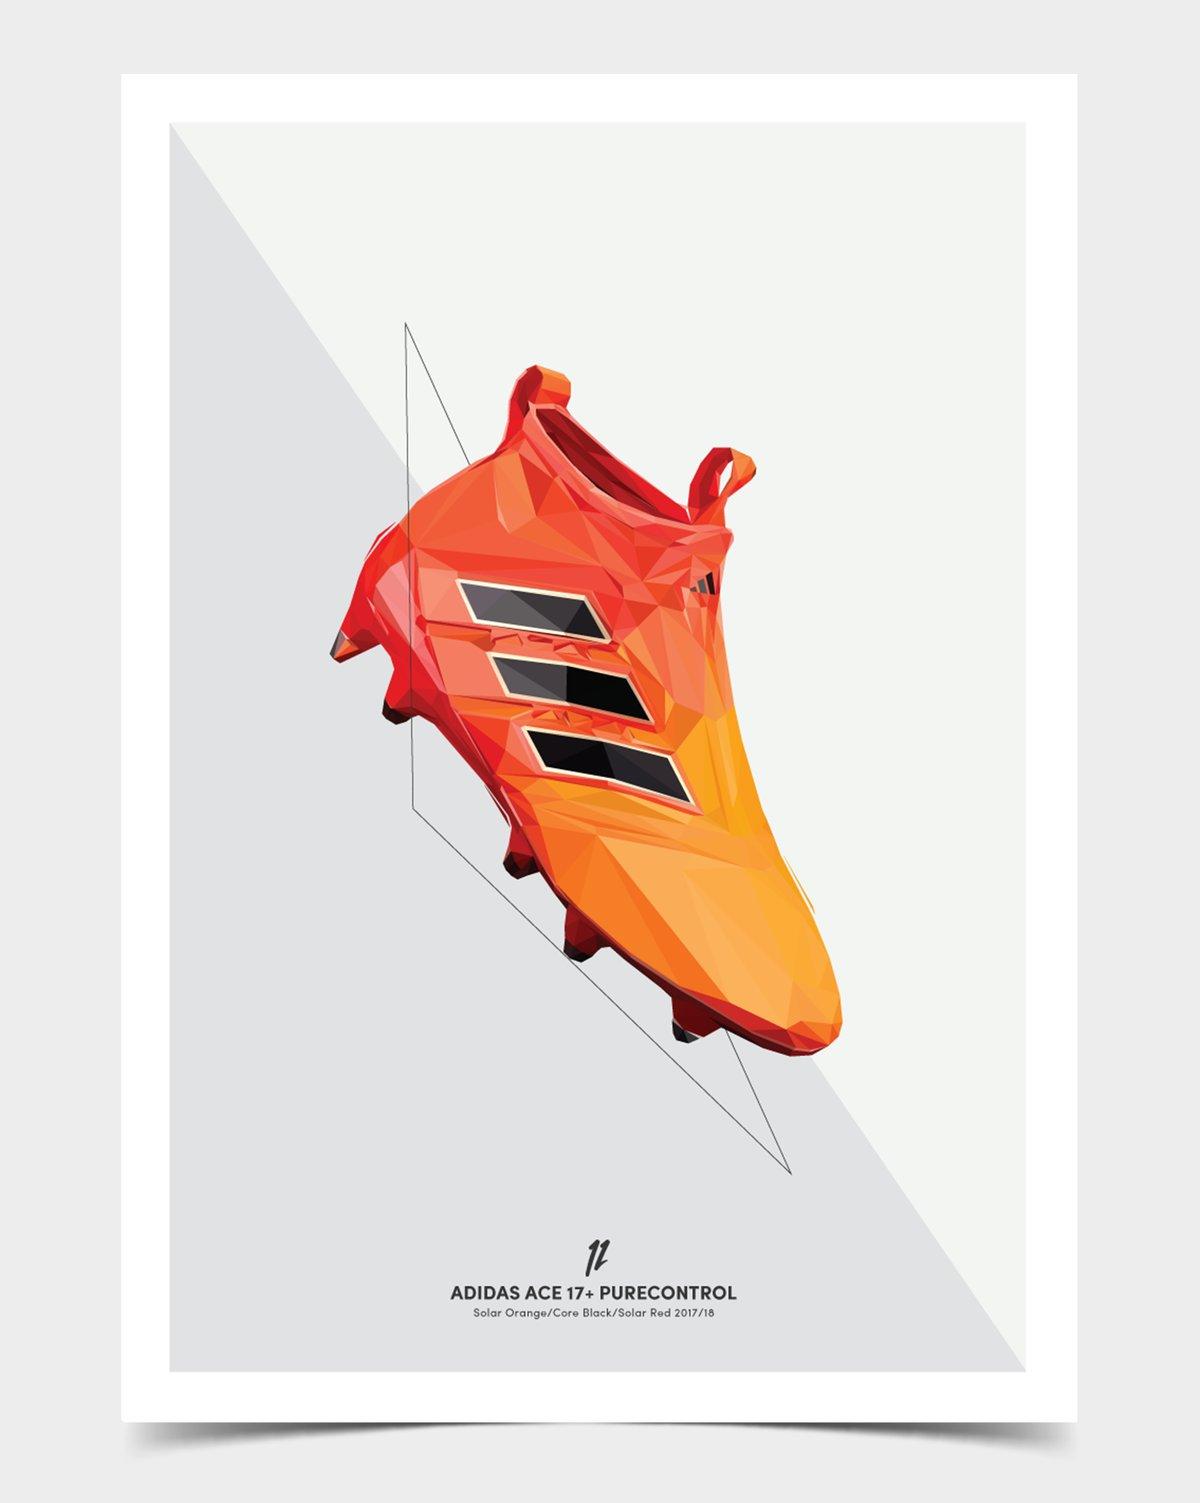 Image of Adidas Ace 17+ Purecontrol